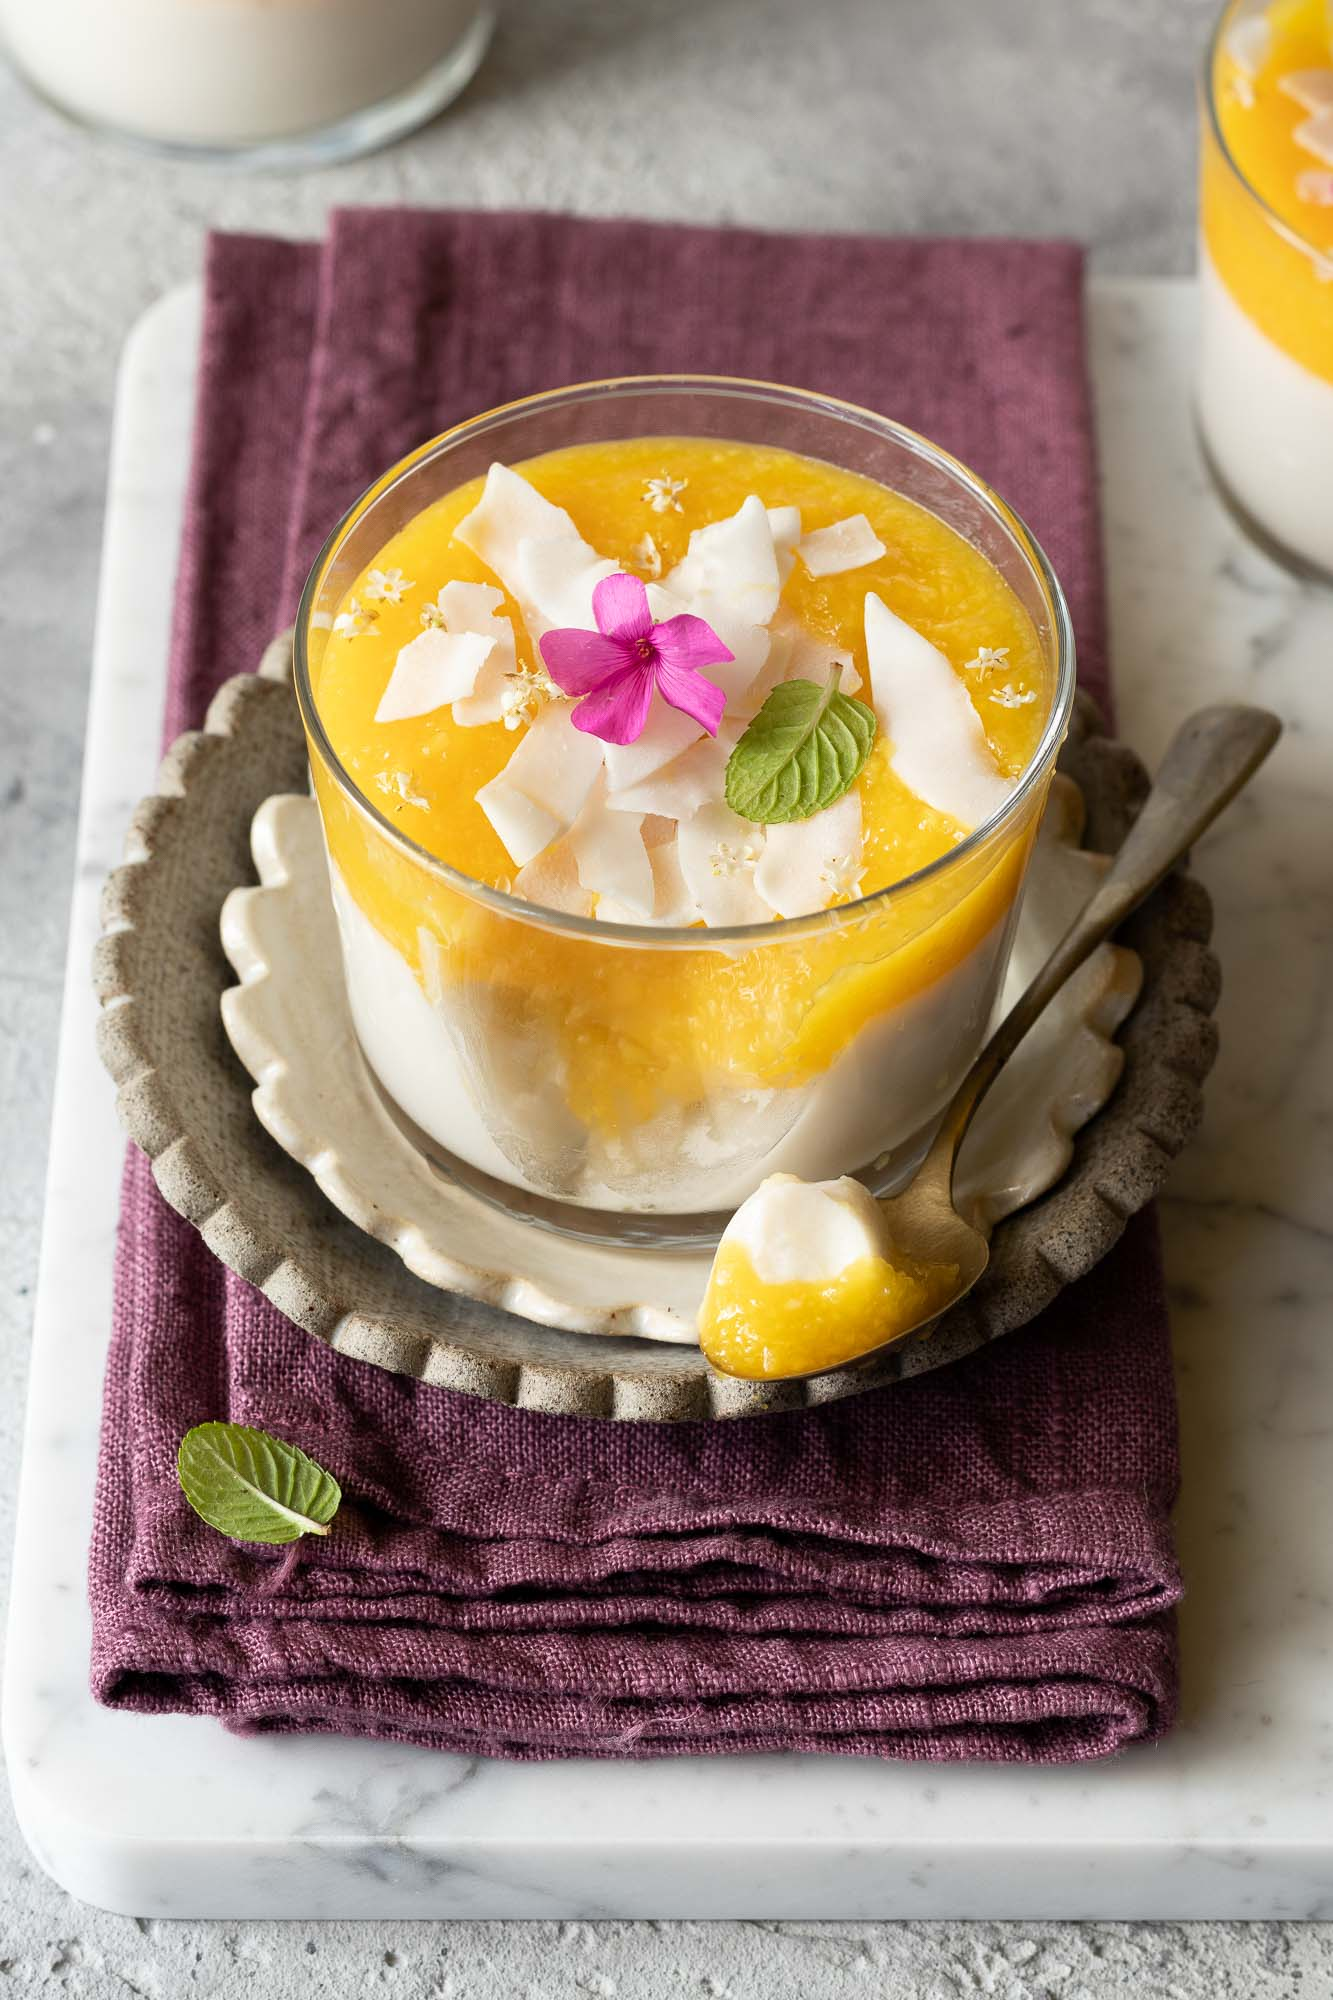 Panna cotta veg cocco e mango